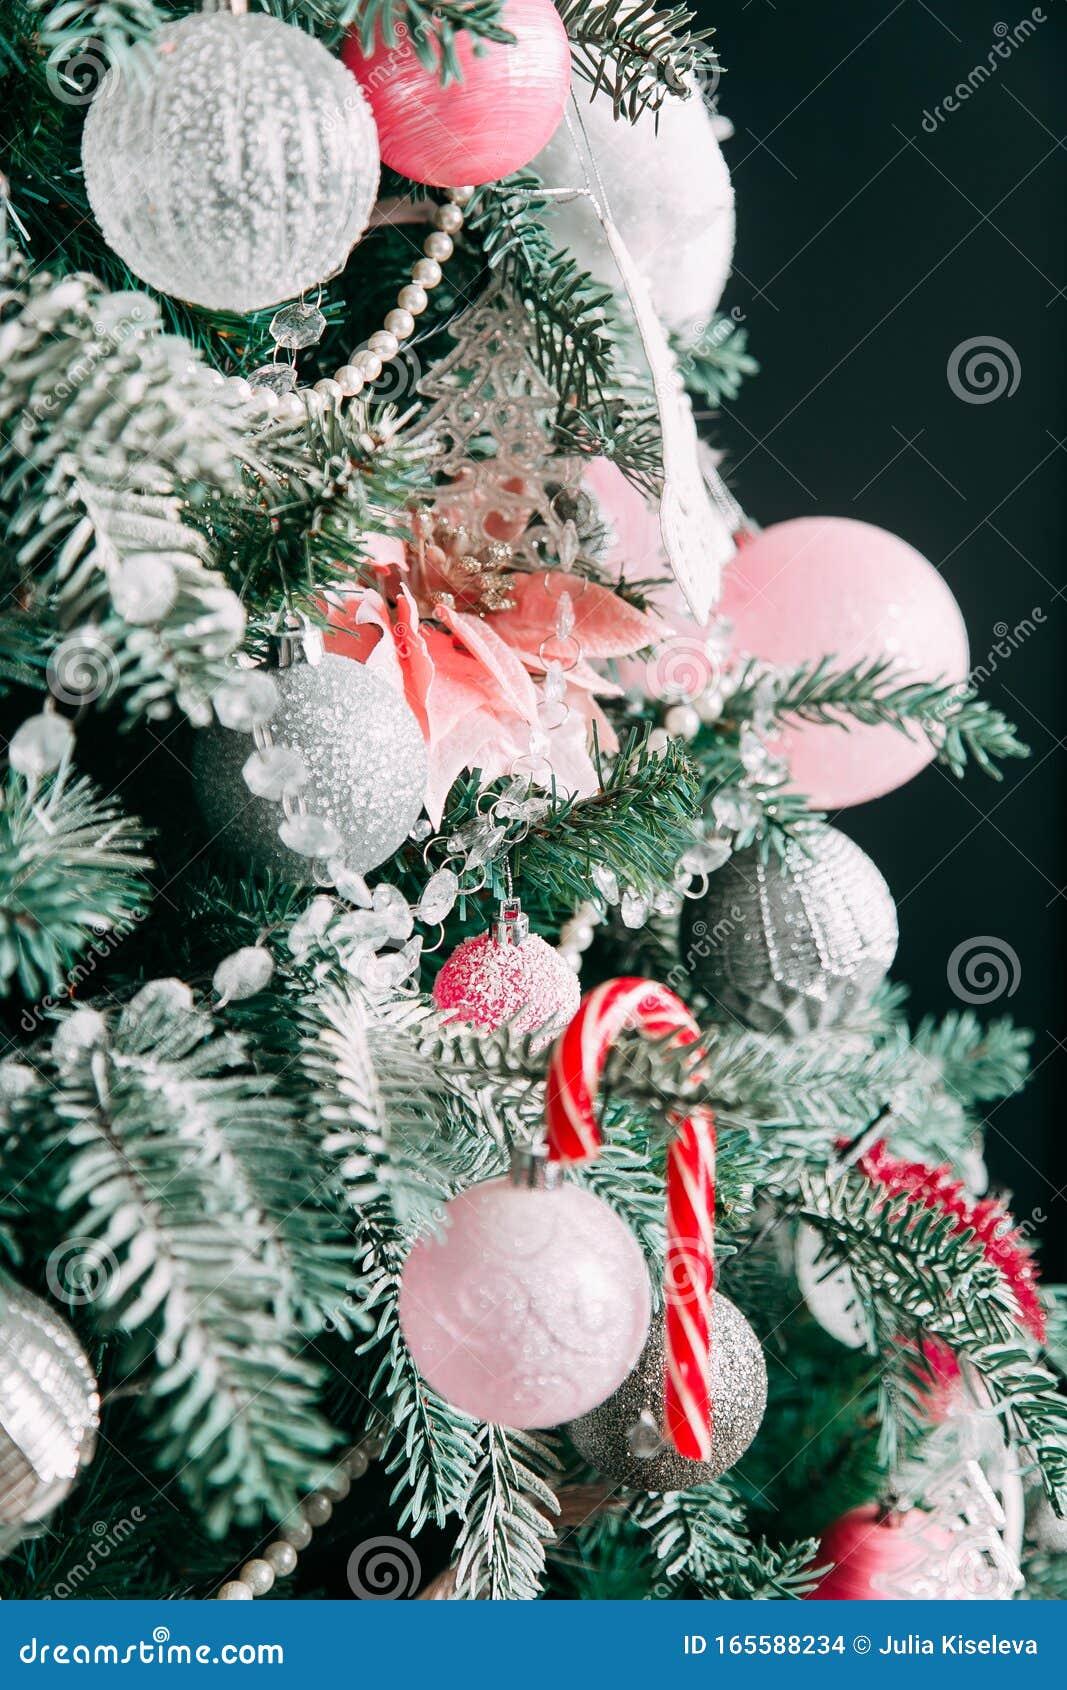 Closeup Of Christmas Tree Decorations Stock Photo Image Of Bright Holiday 165588234